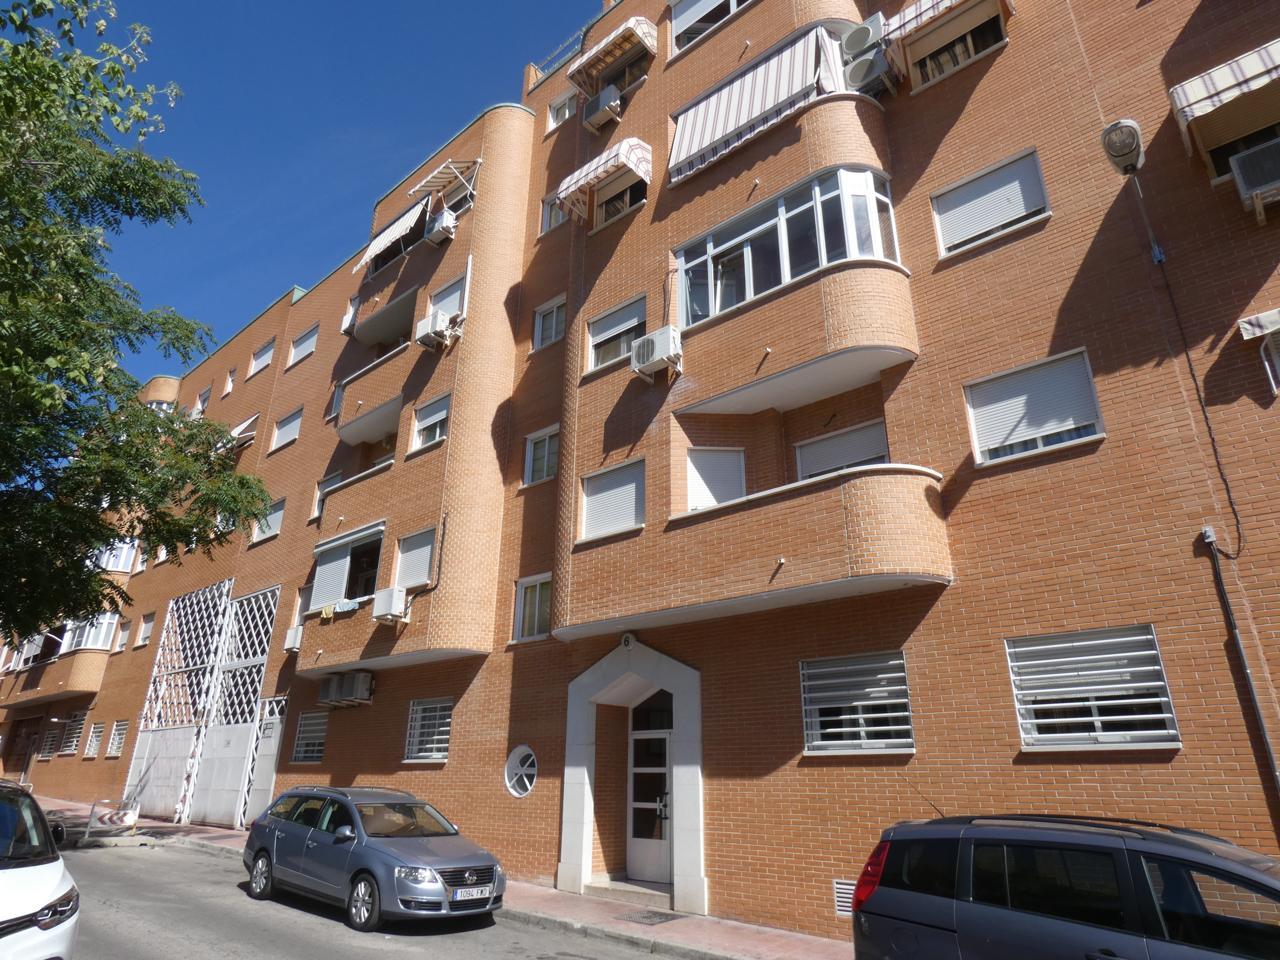 Pisos en valdemoro alquiler piso en alquiler en calle antonio van de pere hospital en valdemoro - Pisos baratos en valdemoro ...